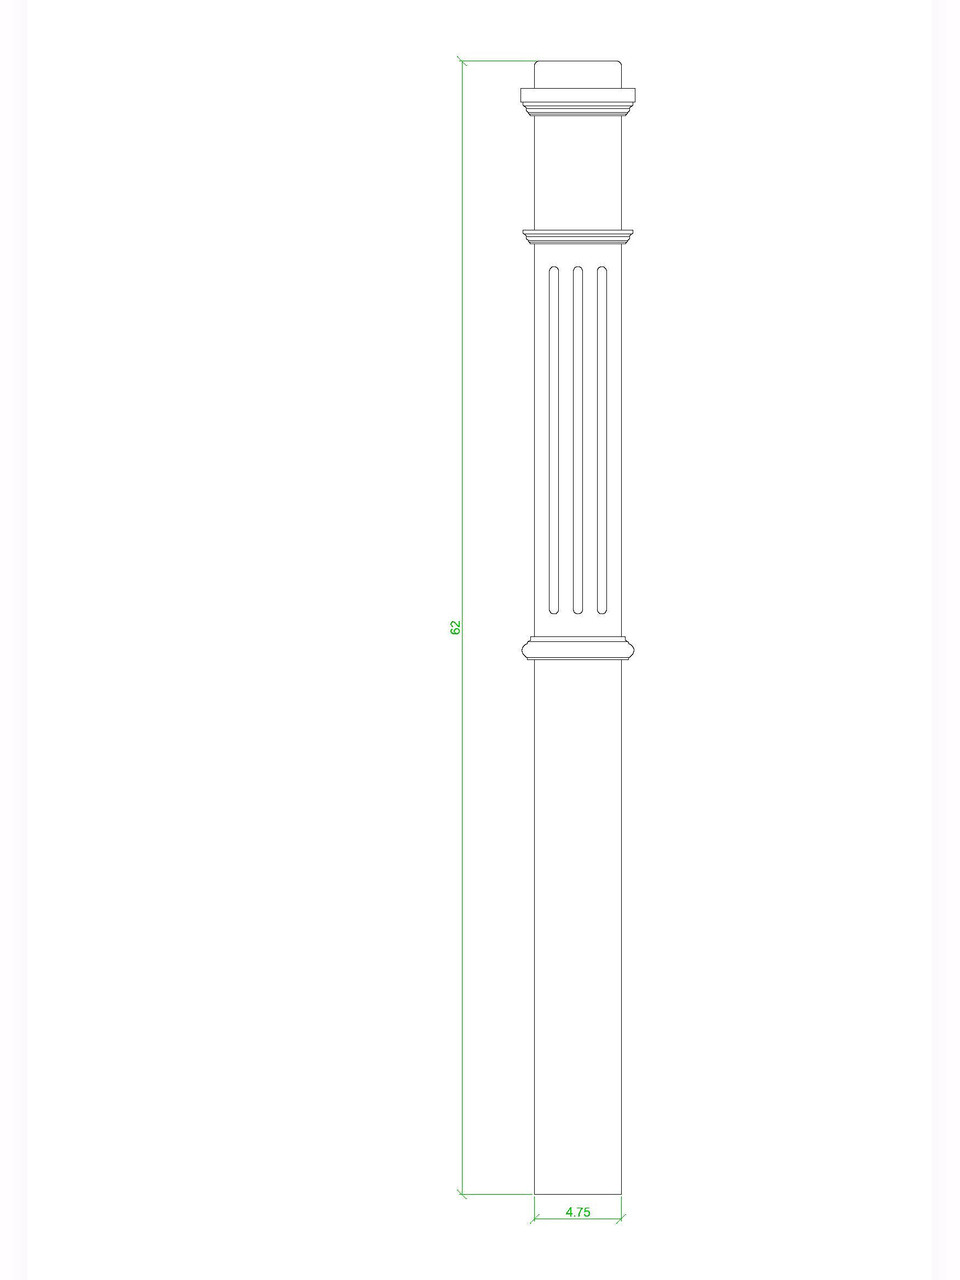 F-4375 Box Newel Post, CADD Image